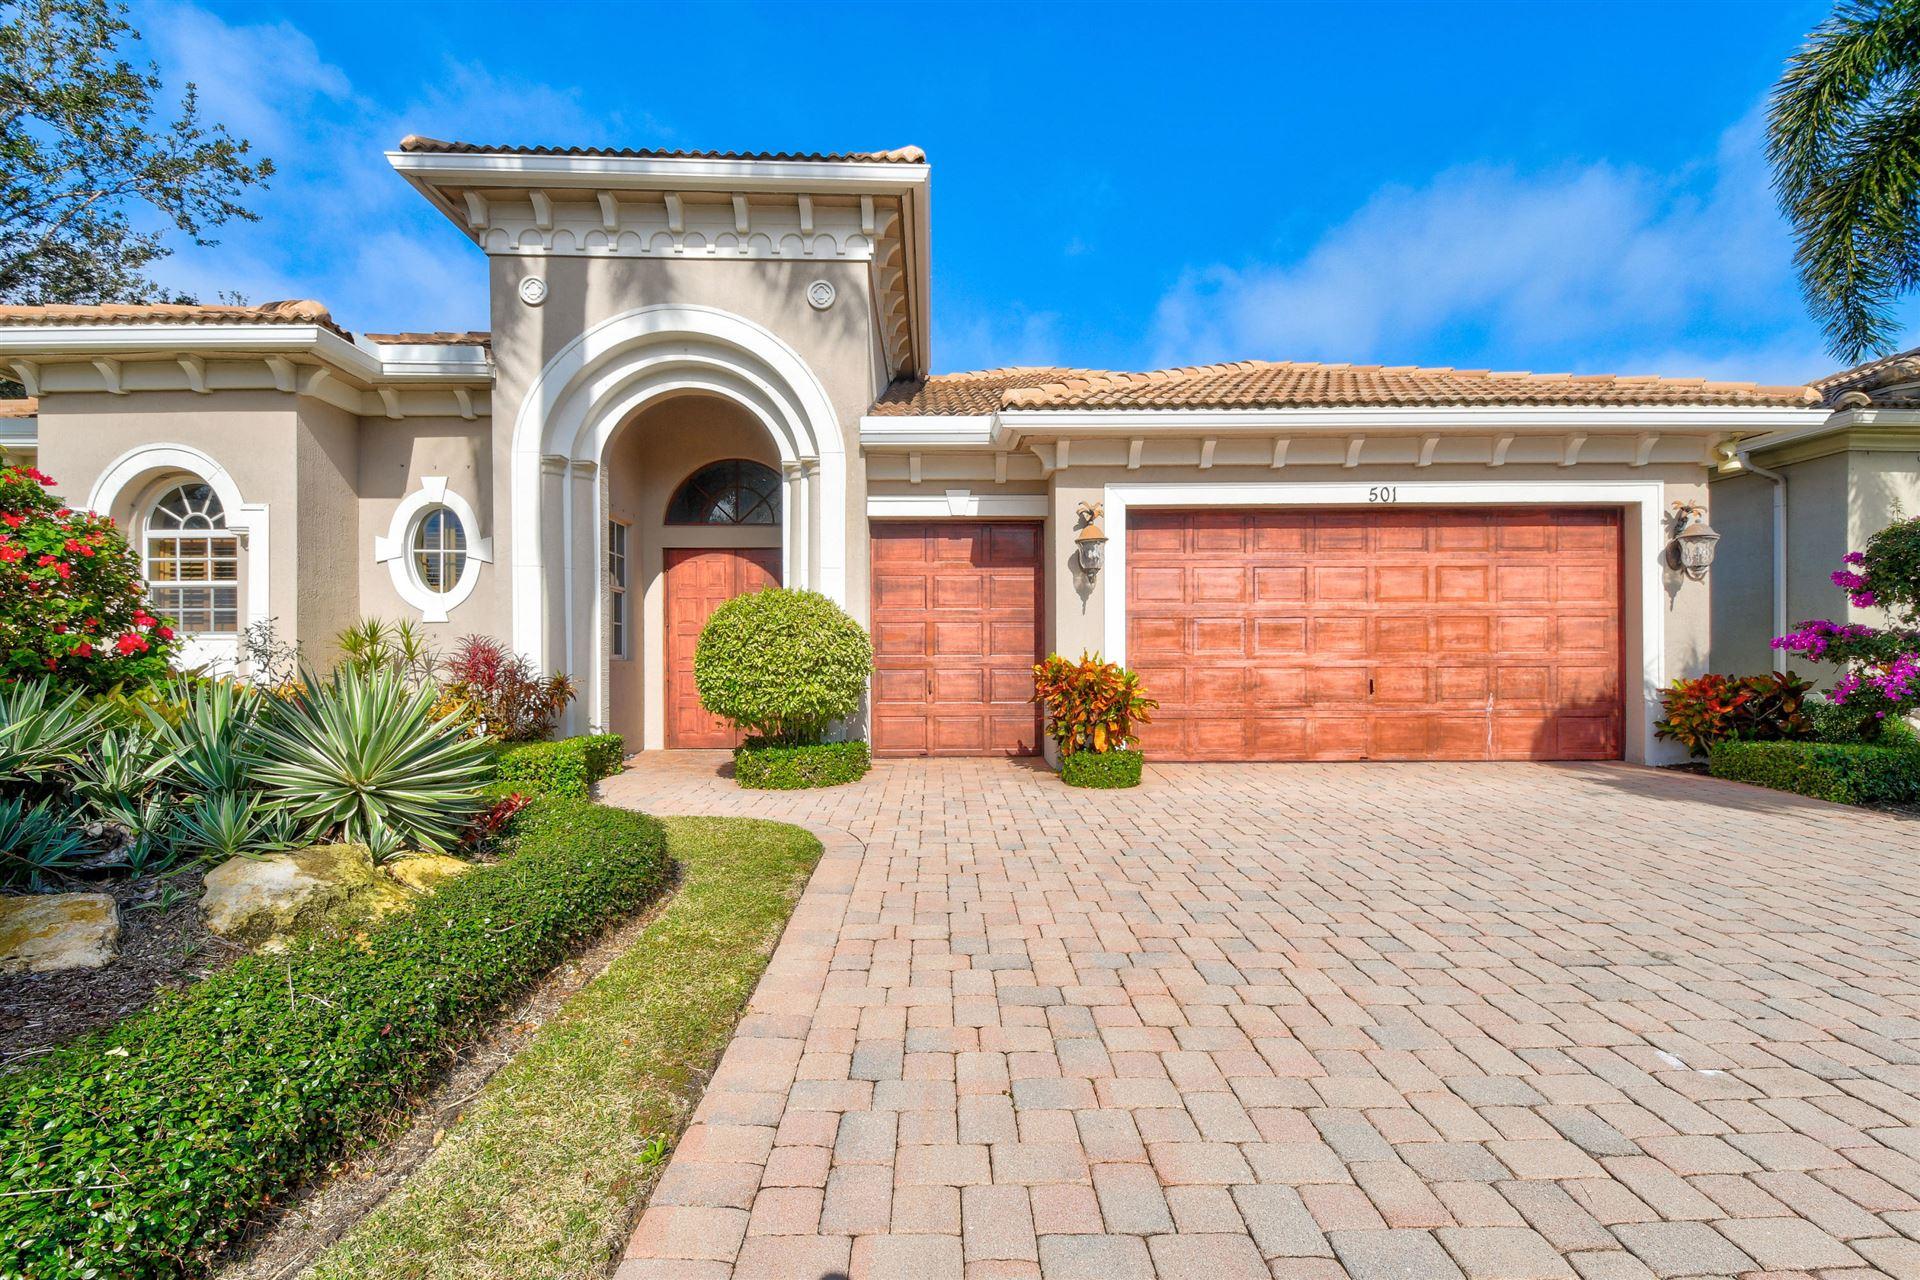 Photo of 501 Les Jardin Drive, Palm Beach Gardens, FL 33410 (MLS # RX-10689249)